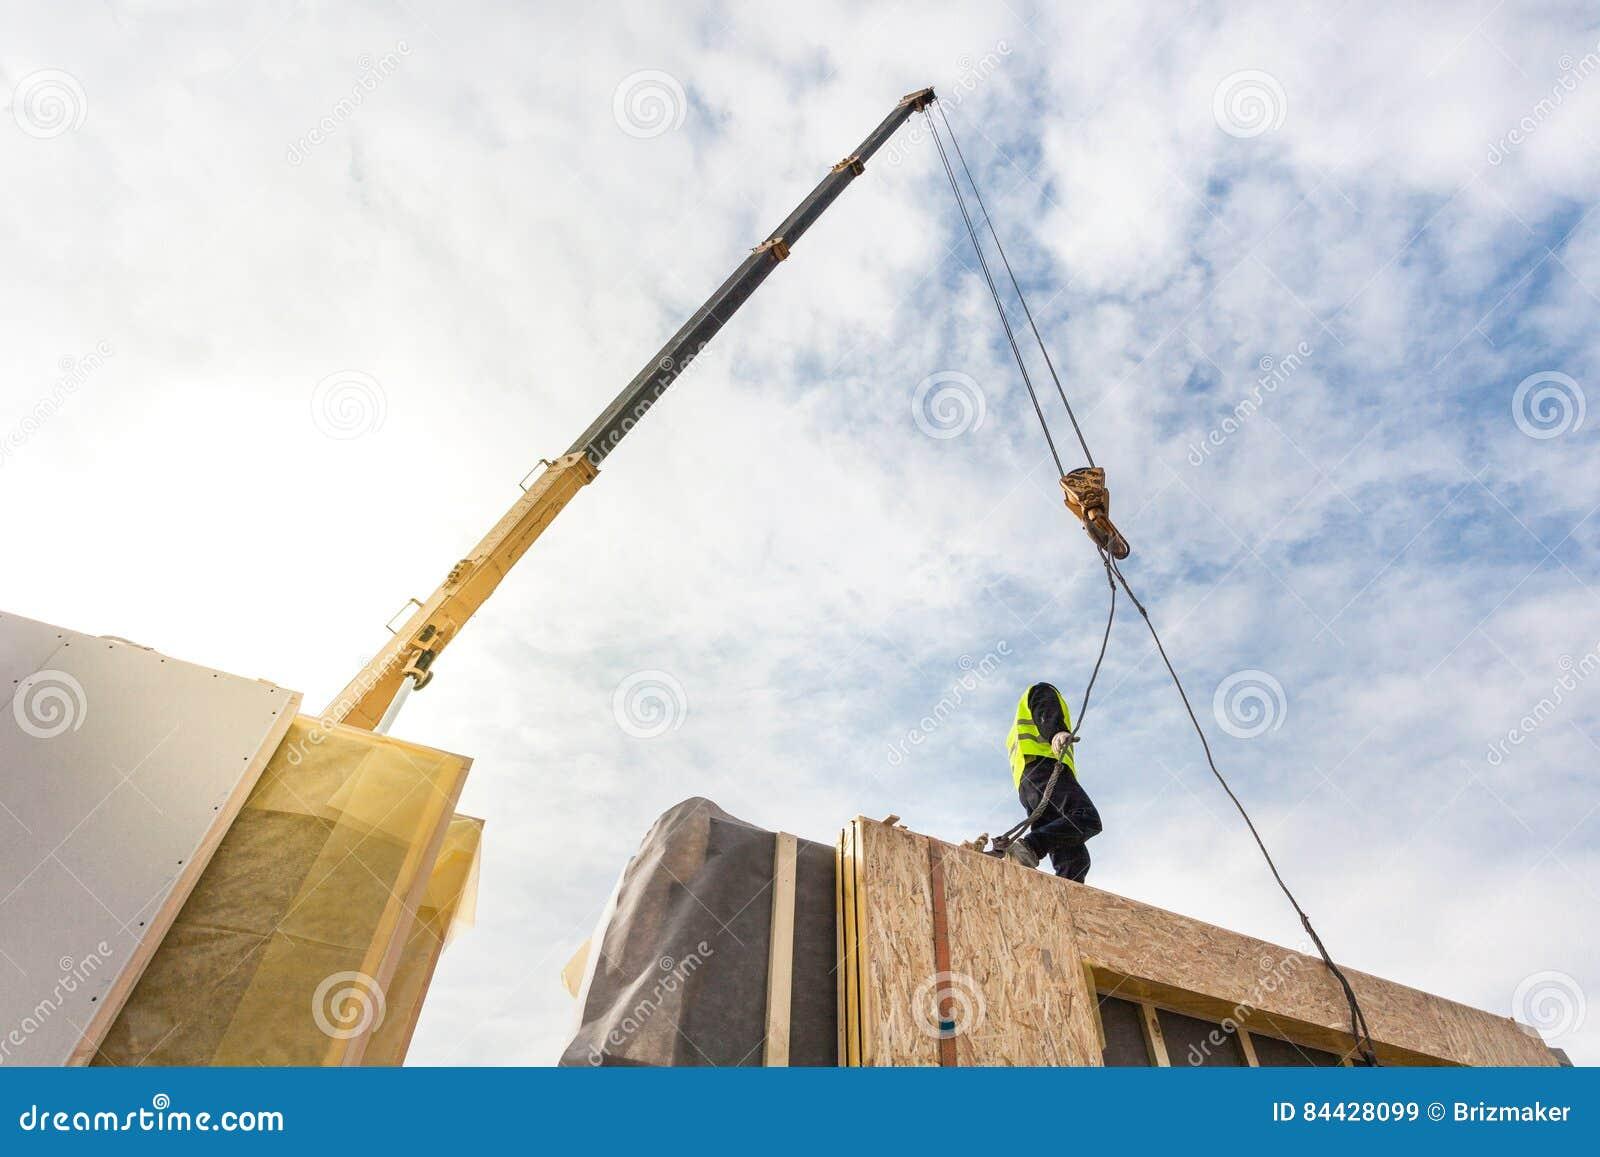 Roofer Builder Worker With Crane Installing Structural